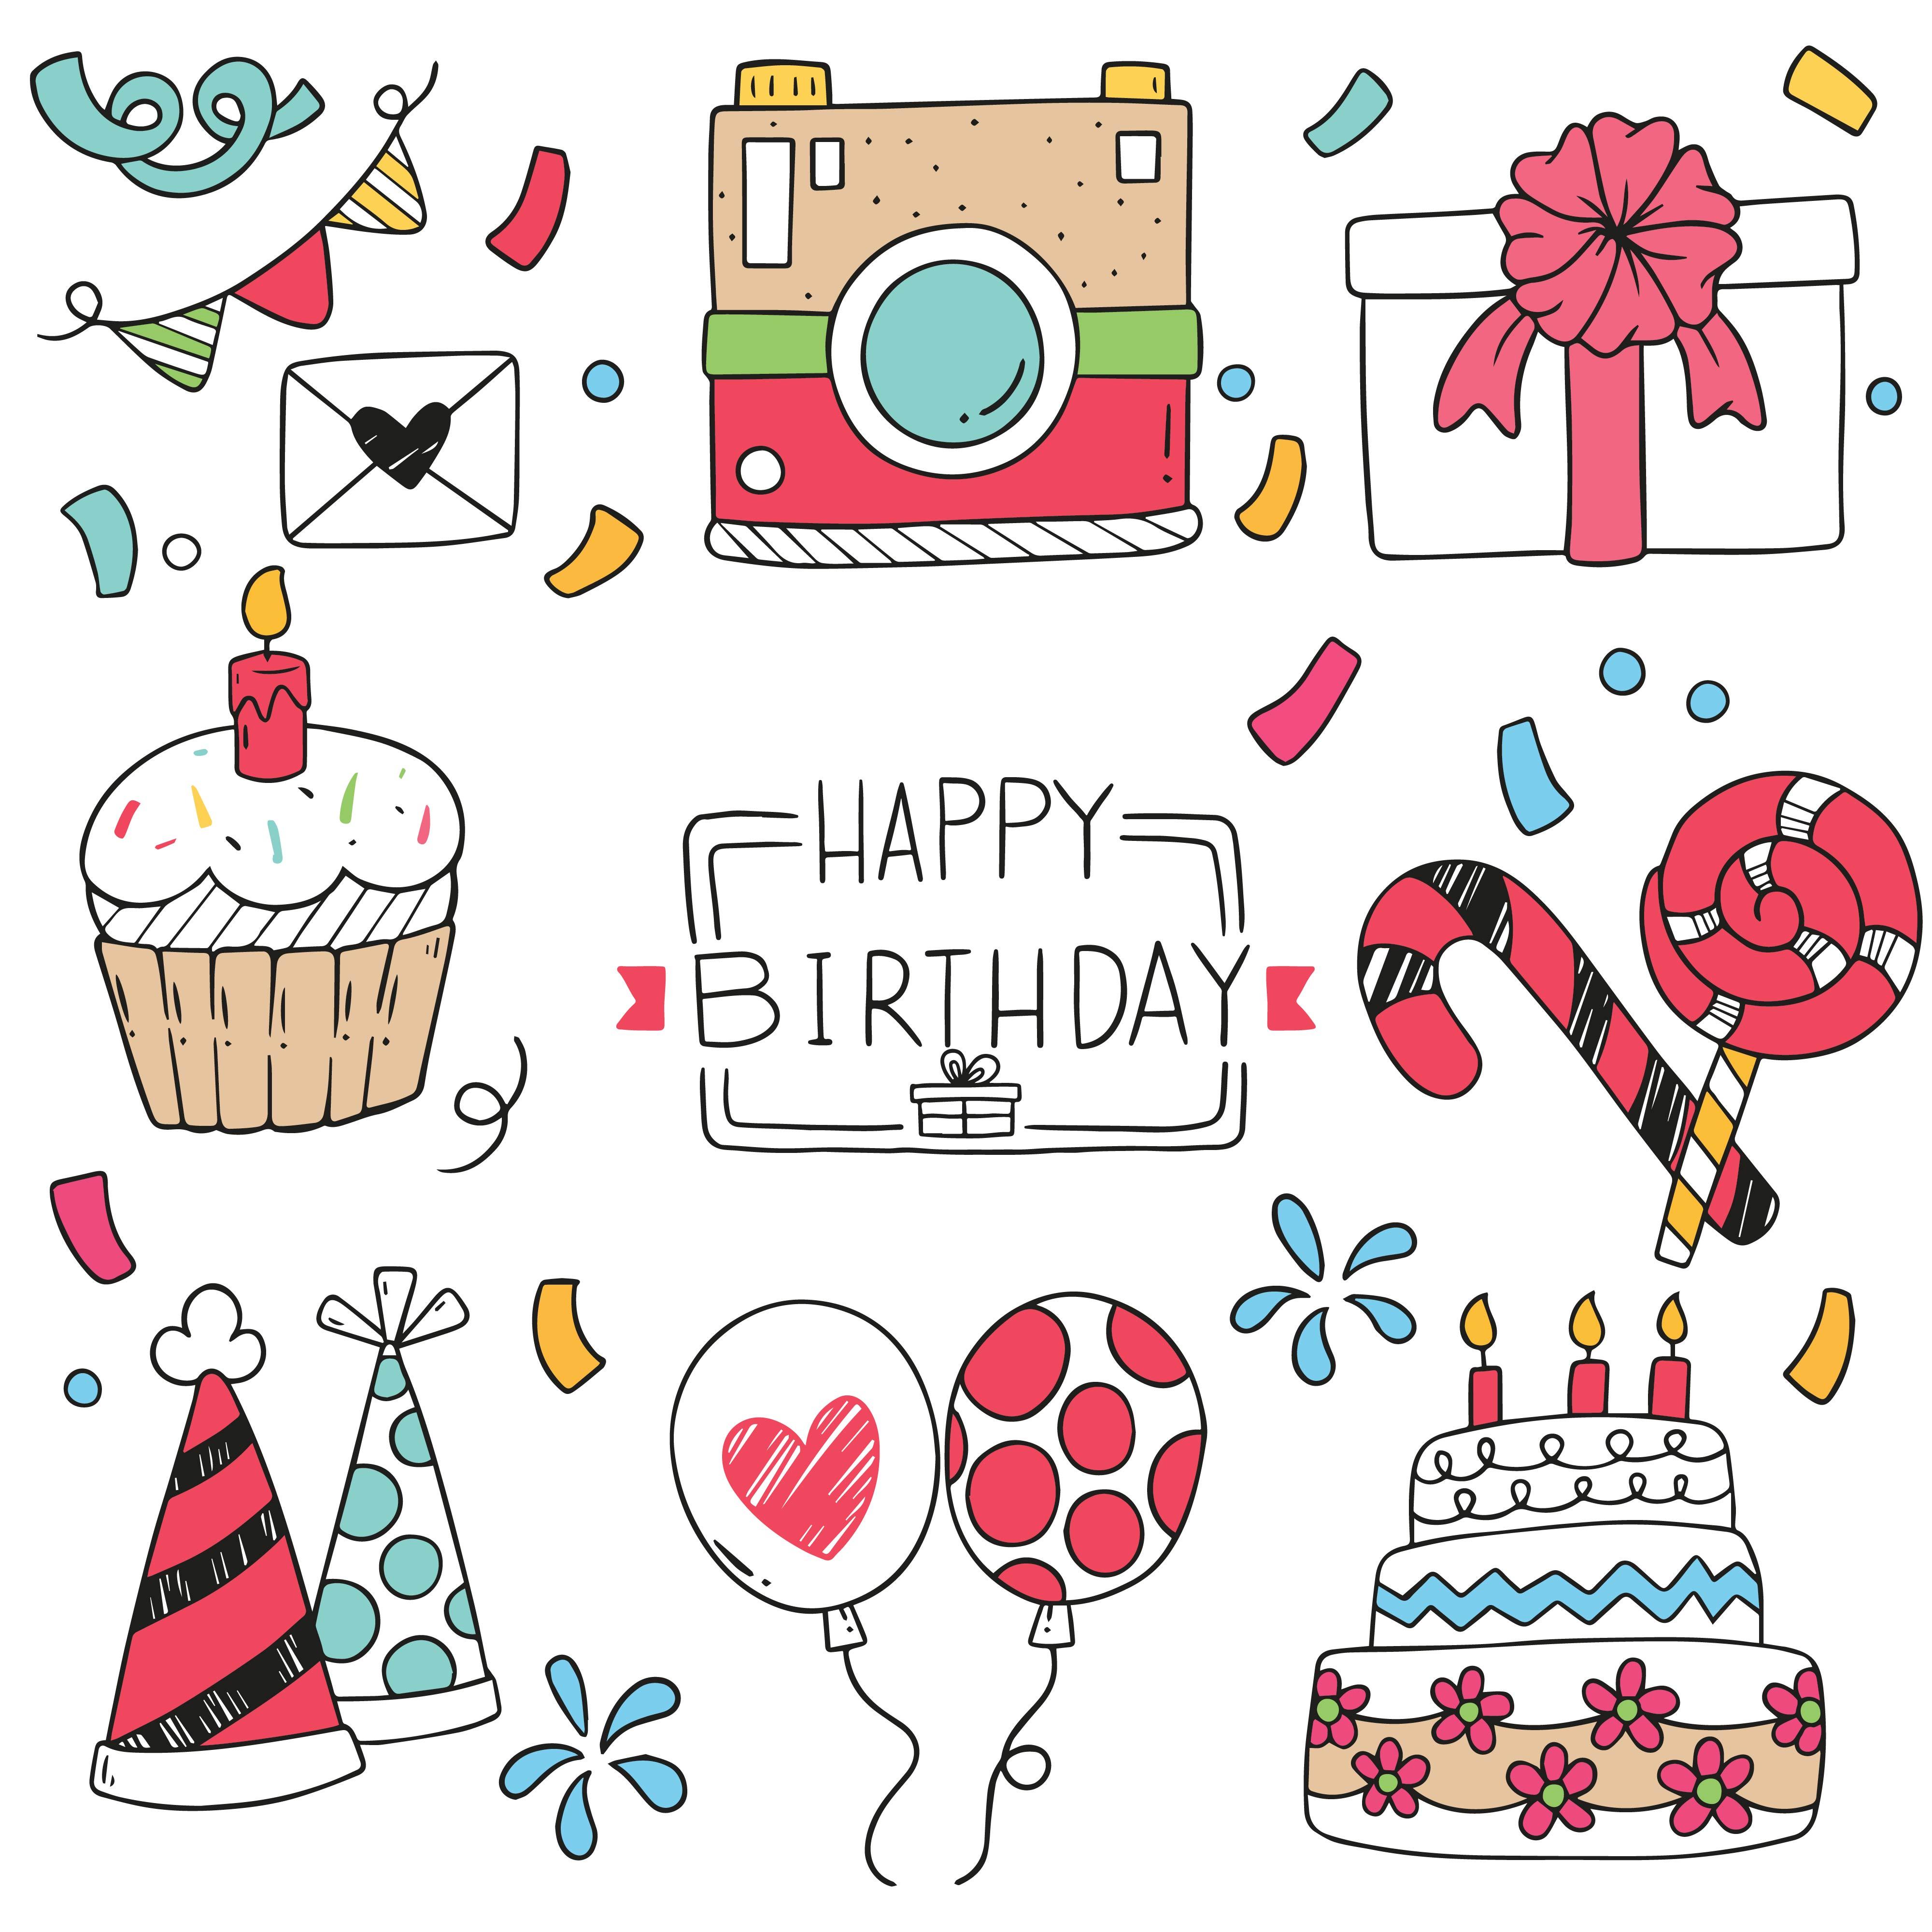 Happy birthday doodle Ornaments - Download Free Vectors ...